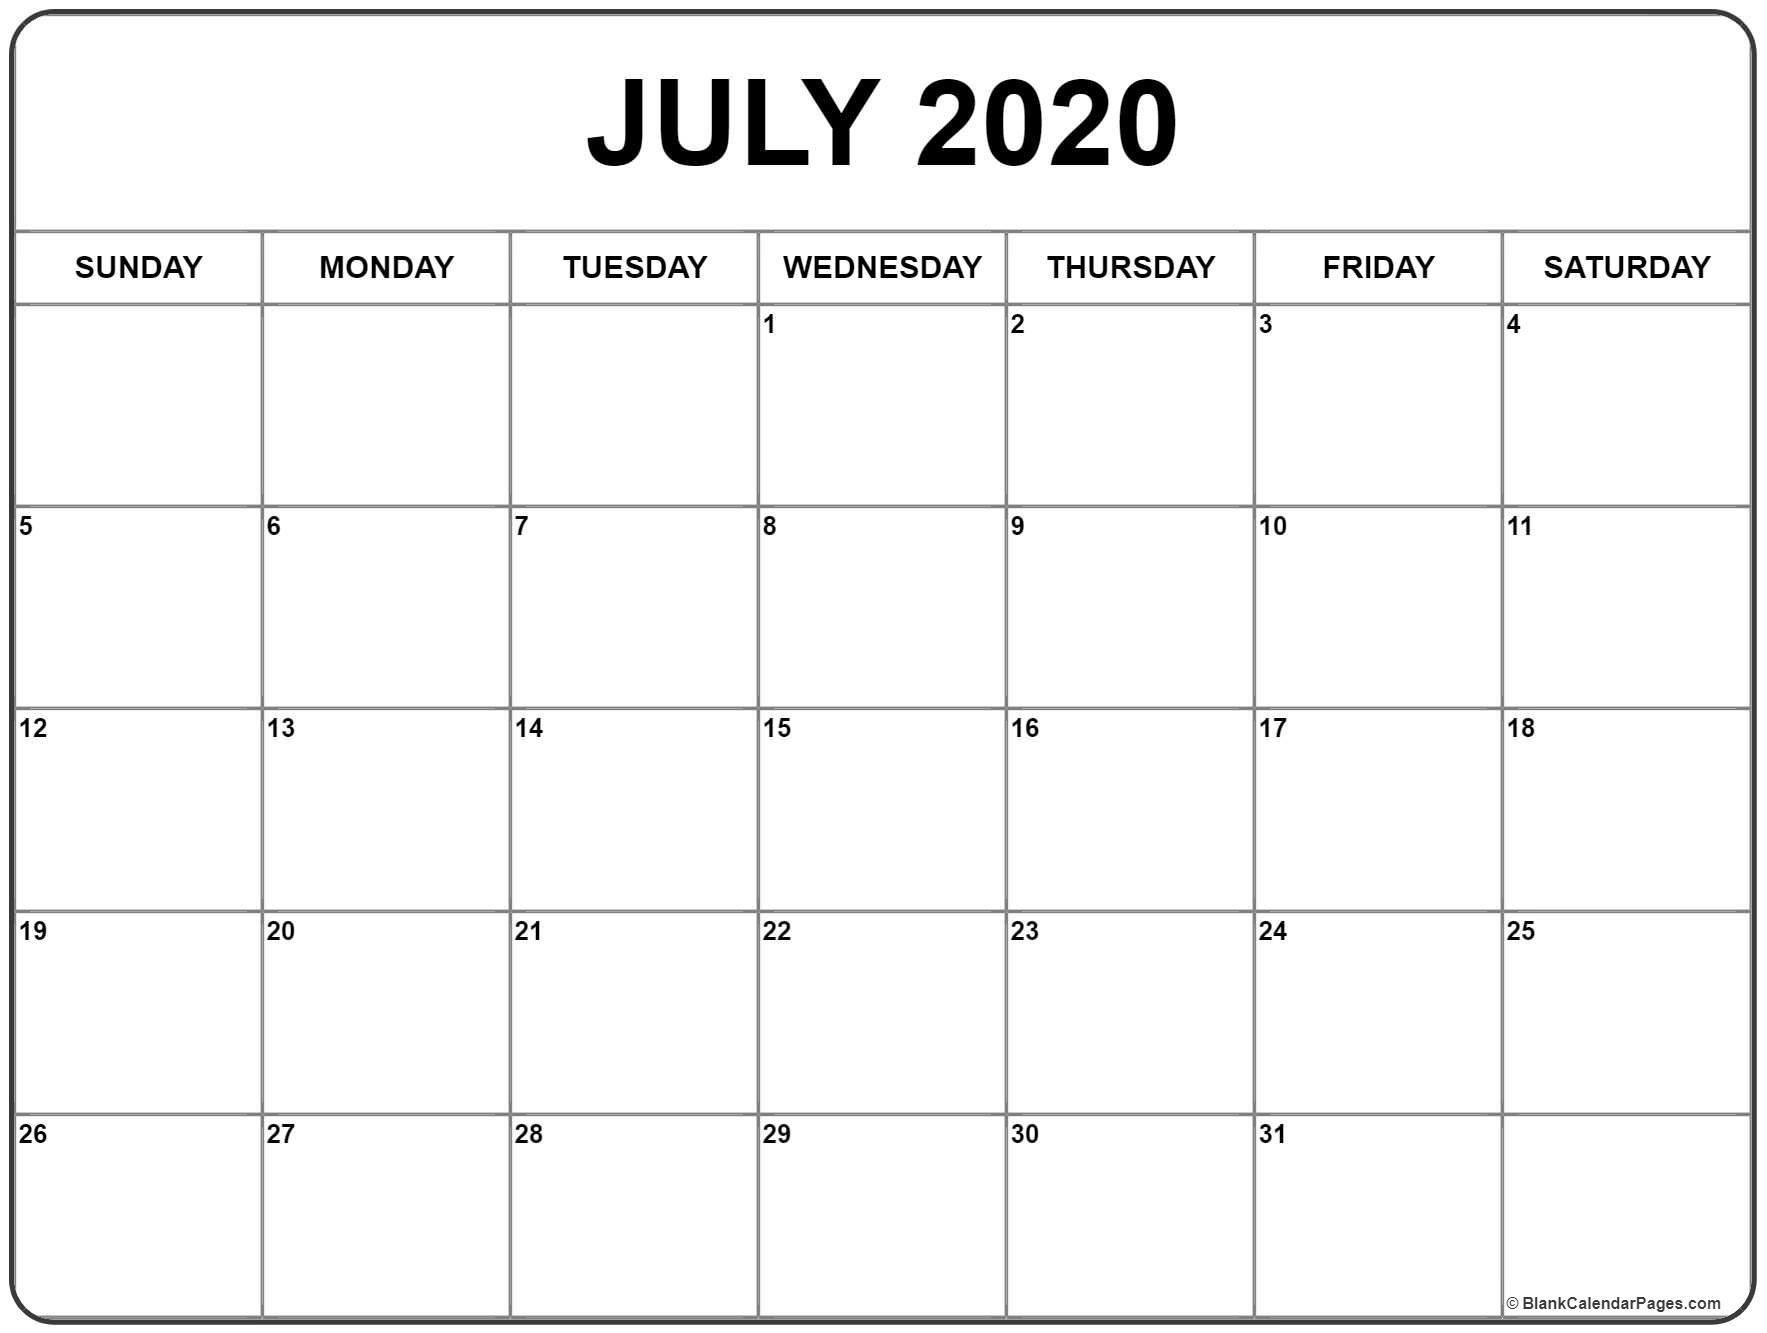 July 2020 Calendar | Printable Calendars | Blank Monthly  Free 2020 Advent Calendar Printable